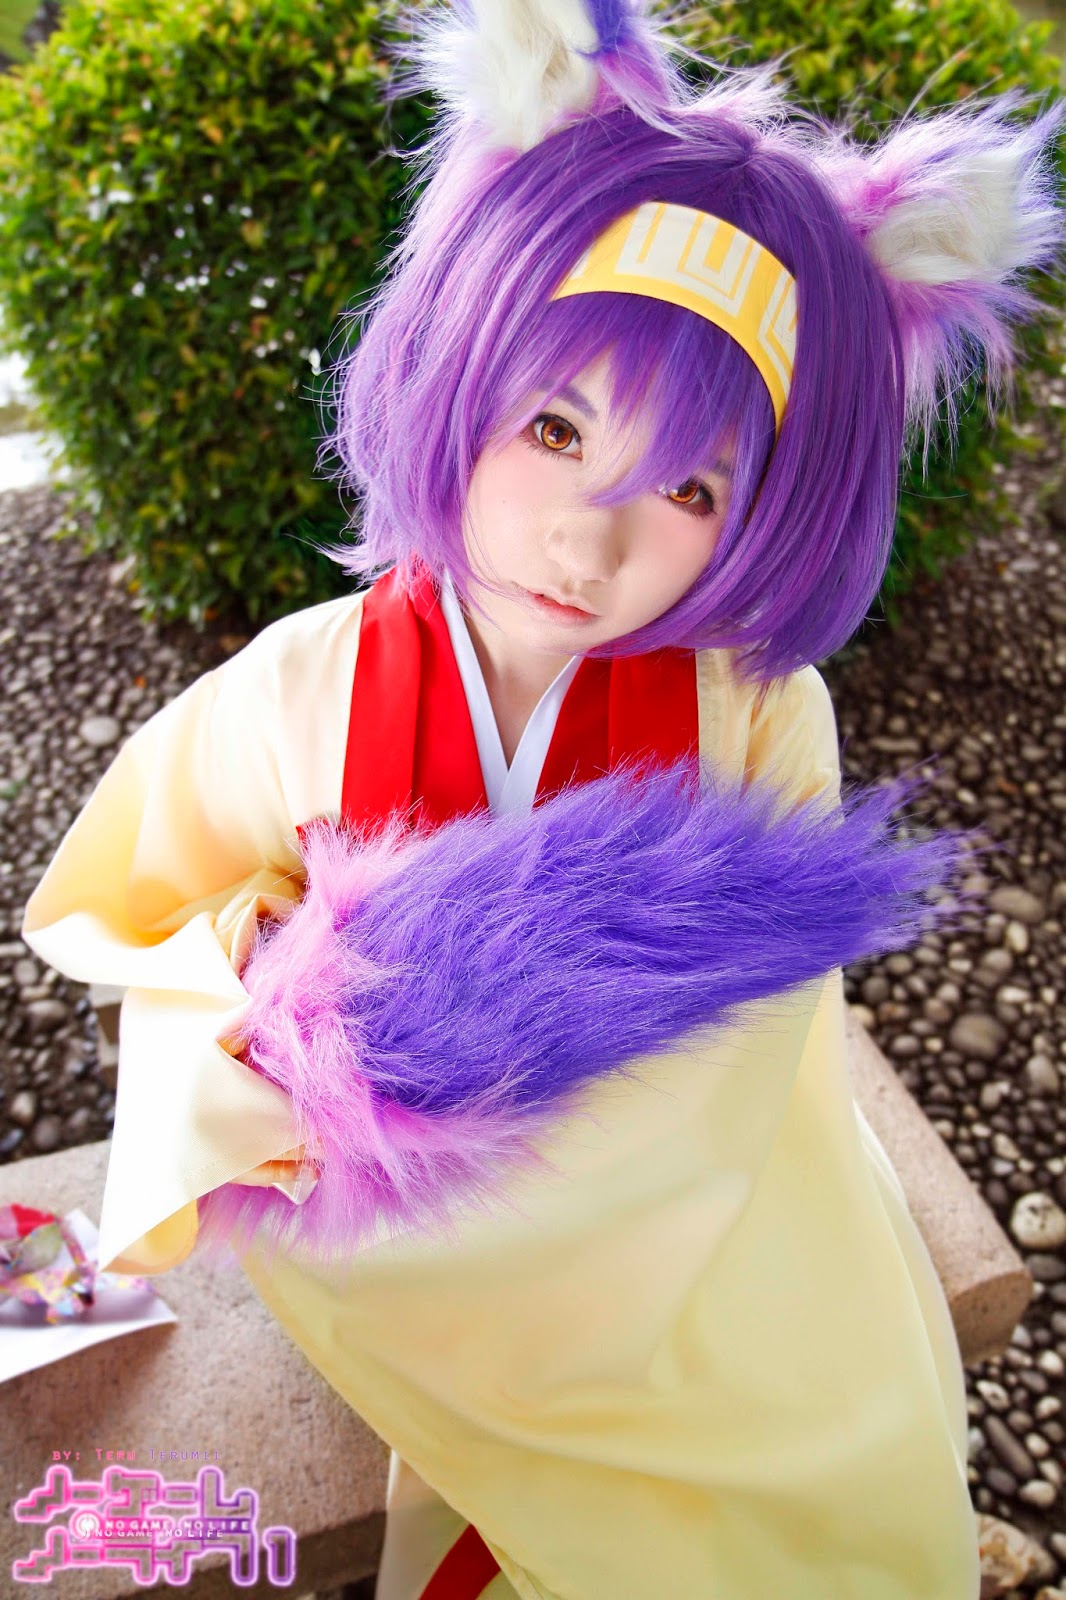 Izuna no game no life cosplay